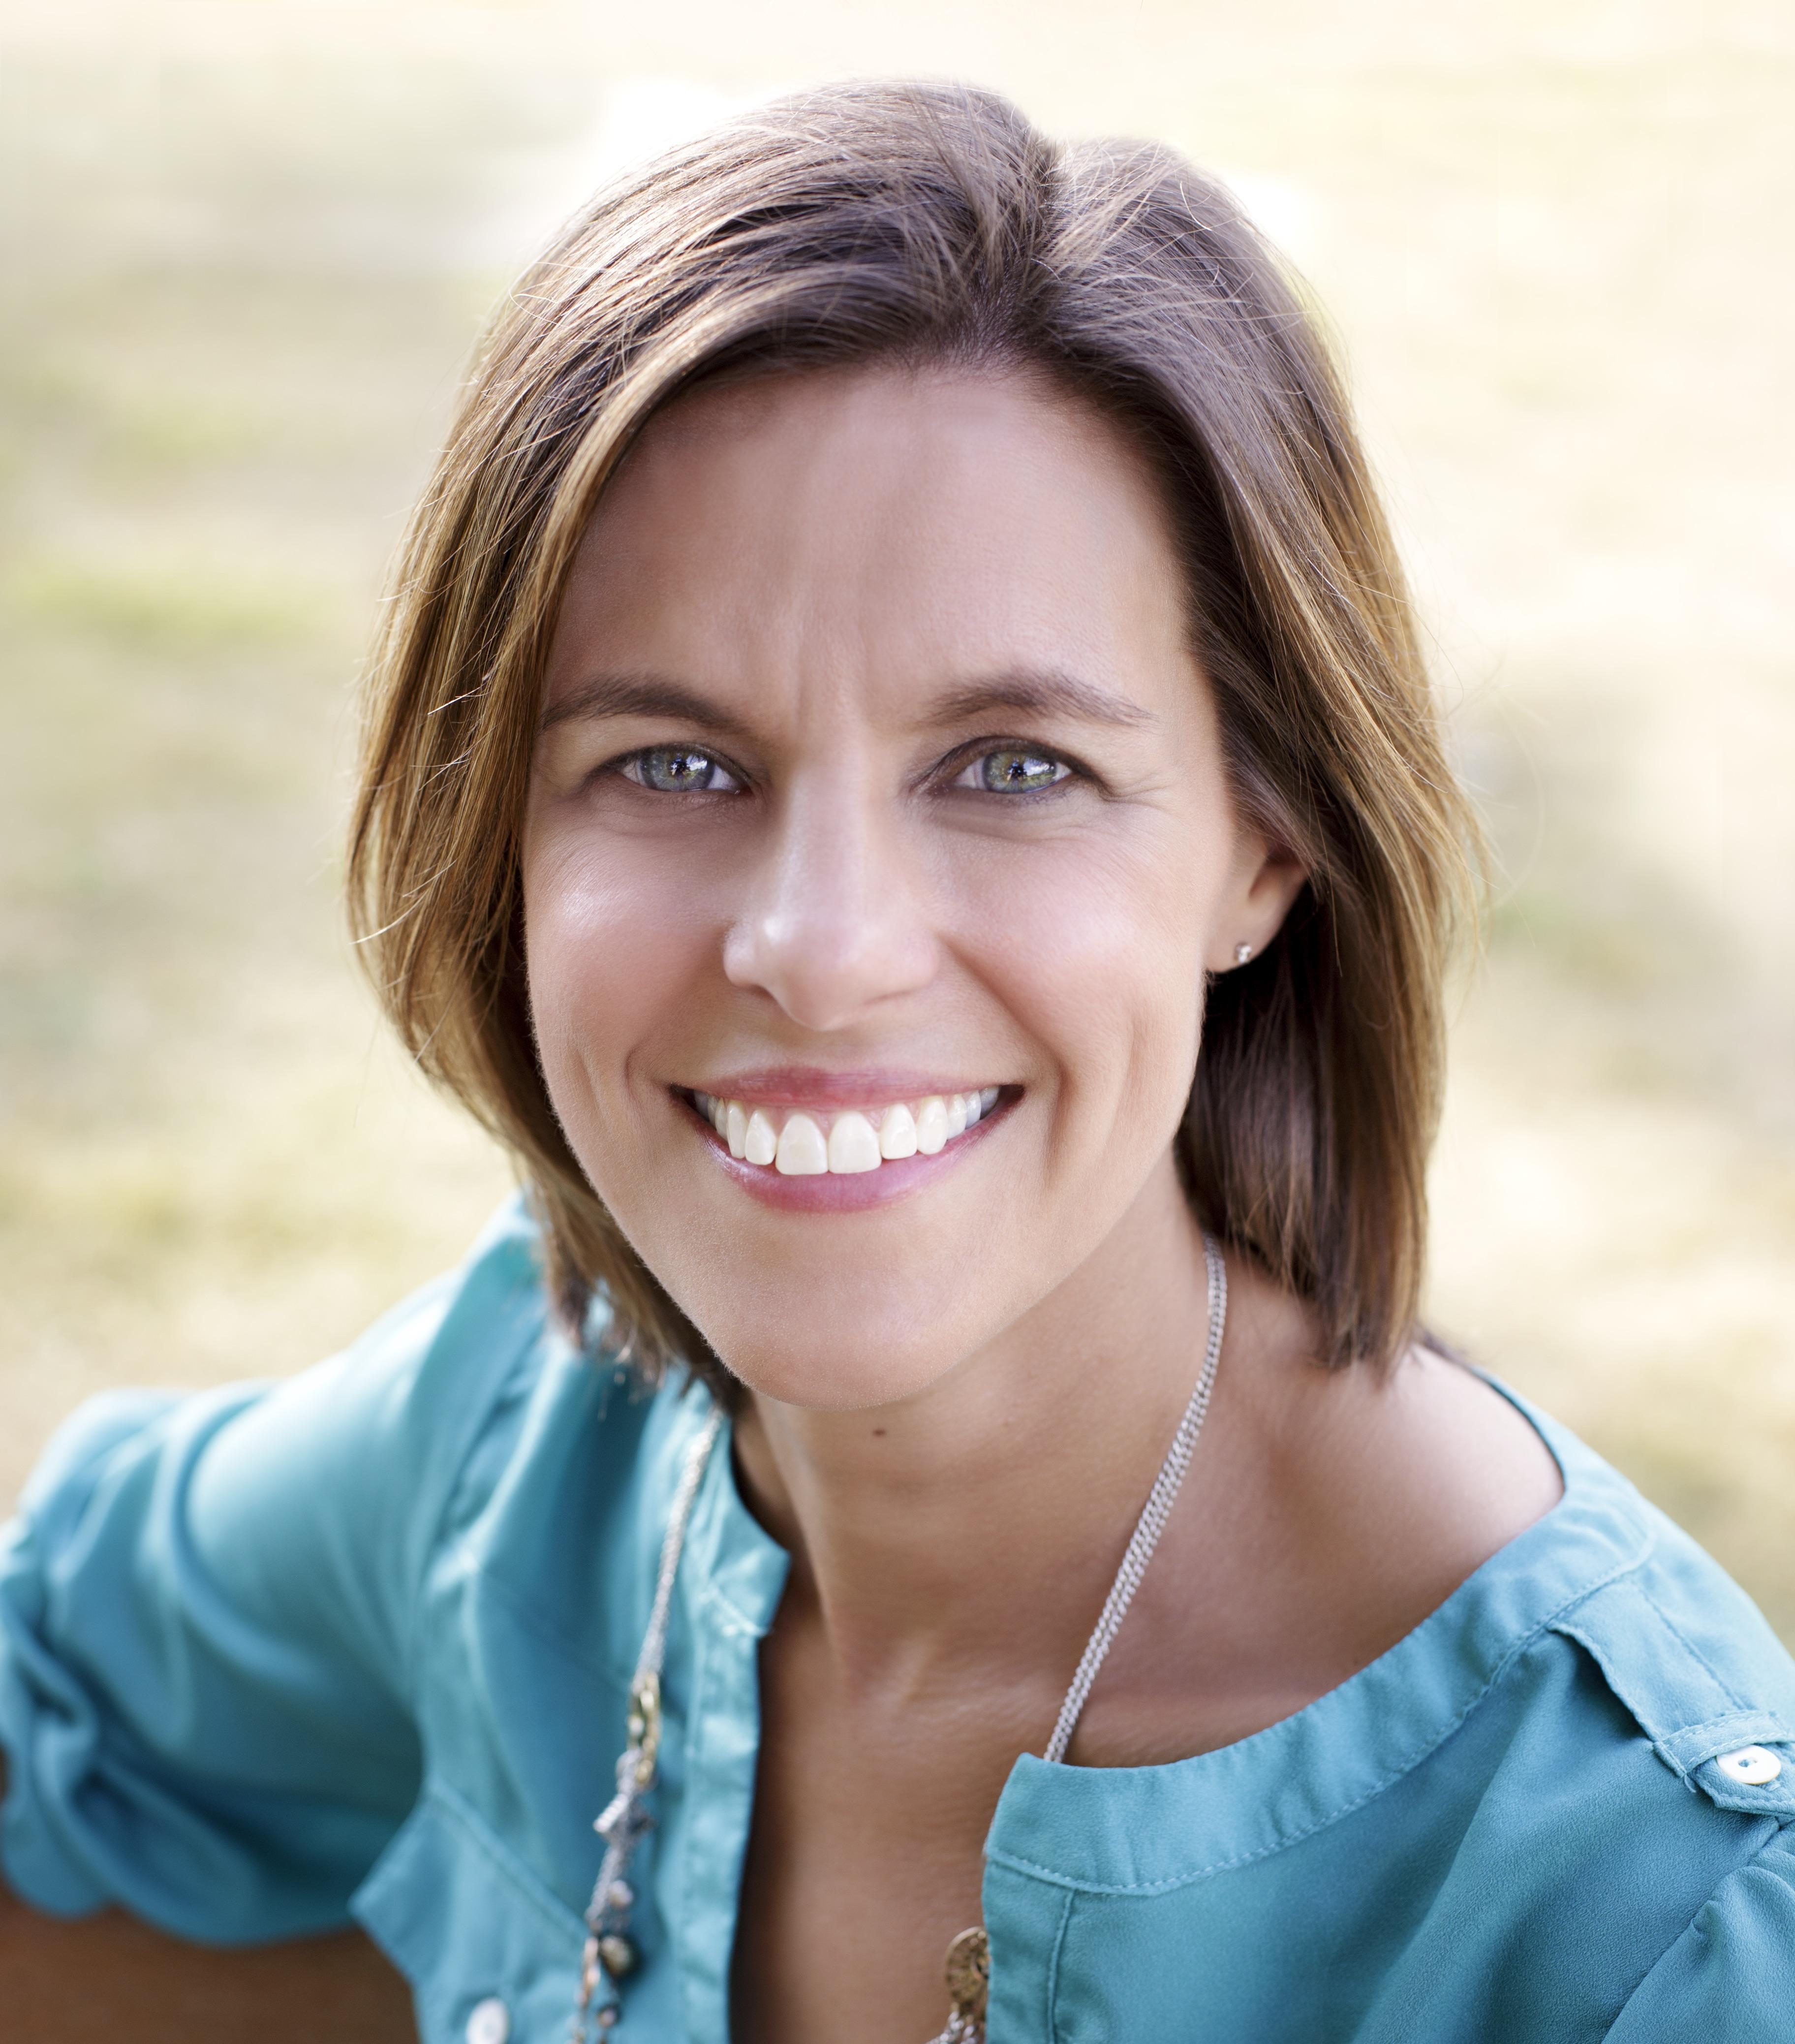 Colleen Kessler